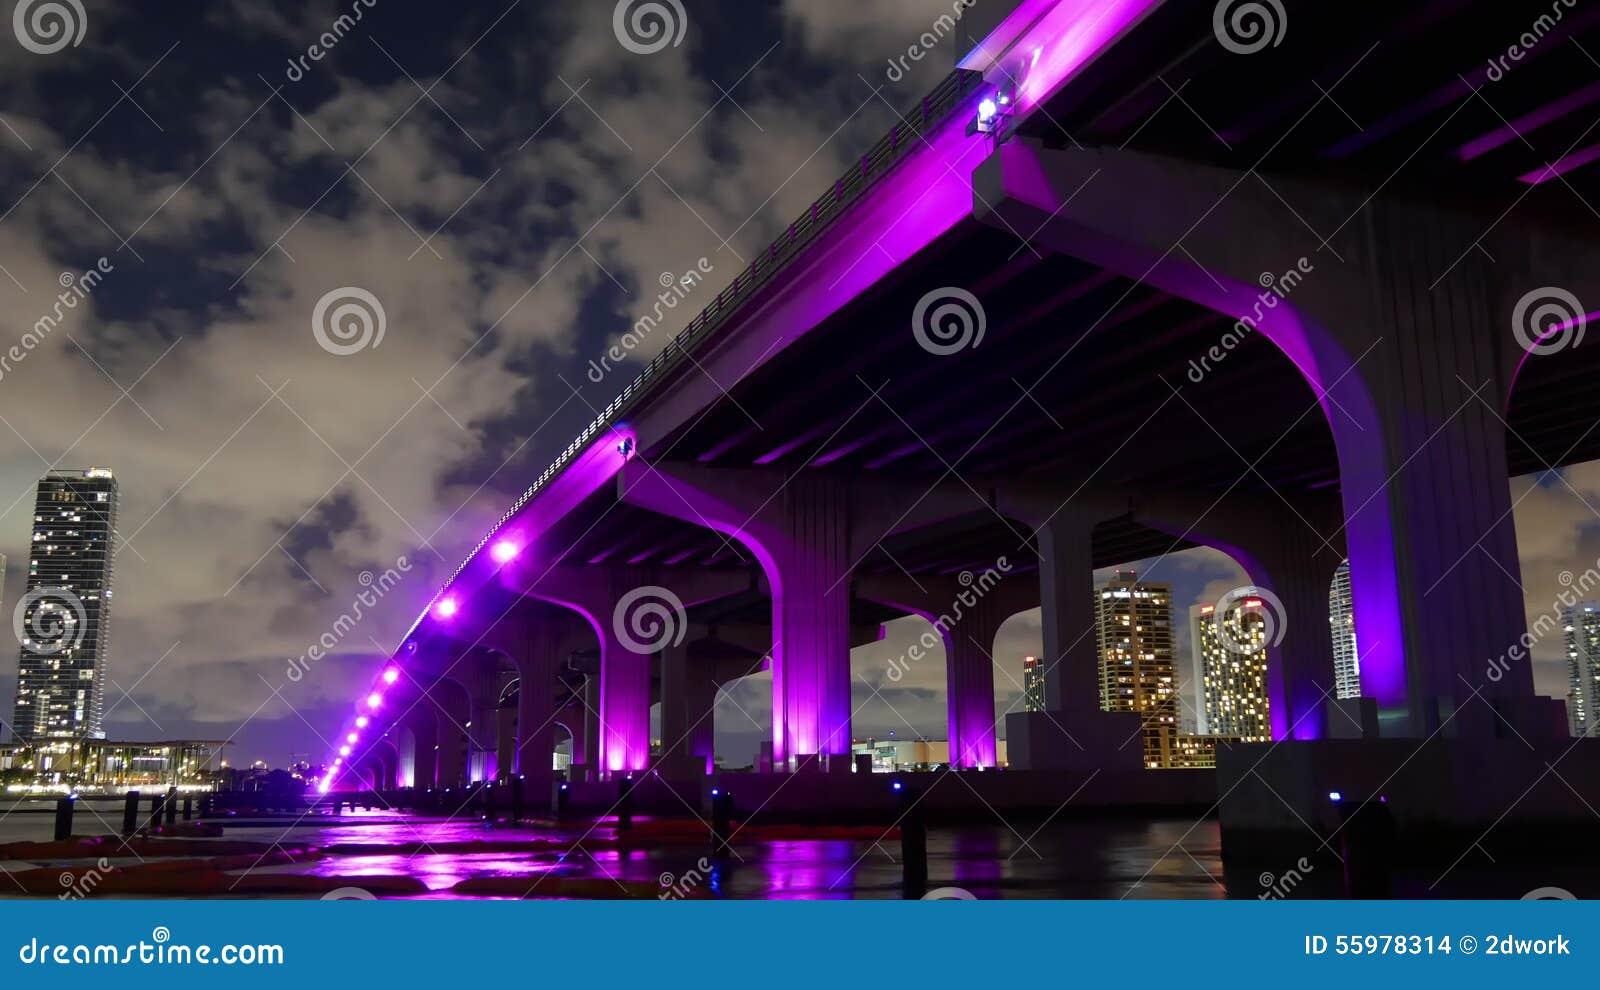 Night Light Sky Miami Famous Downtown Bridge Illumination 4k Time Lapse Florida Usa Stock Footage - Video of boat famous 55978314 & Night Light Sky Miami Famous Downtown Bridge Illumination 4k Time ...